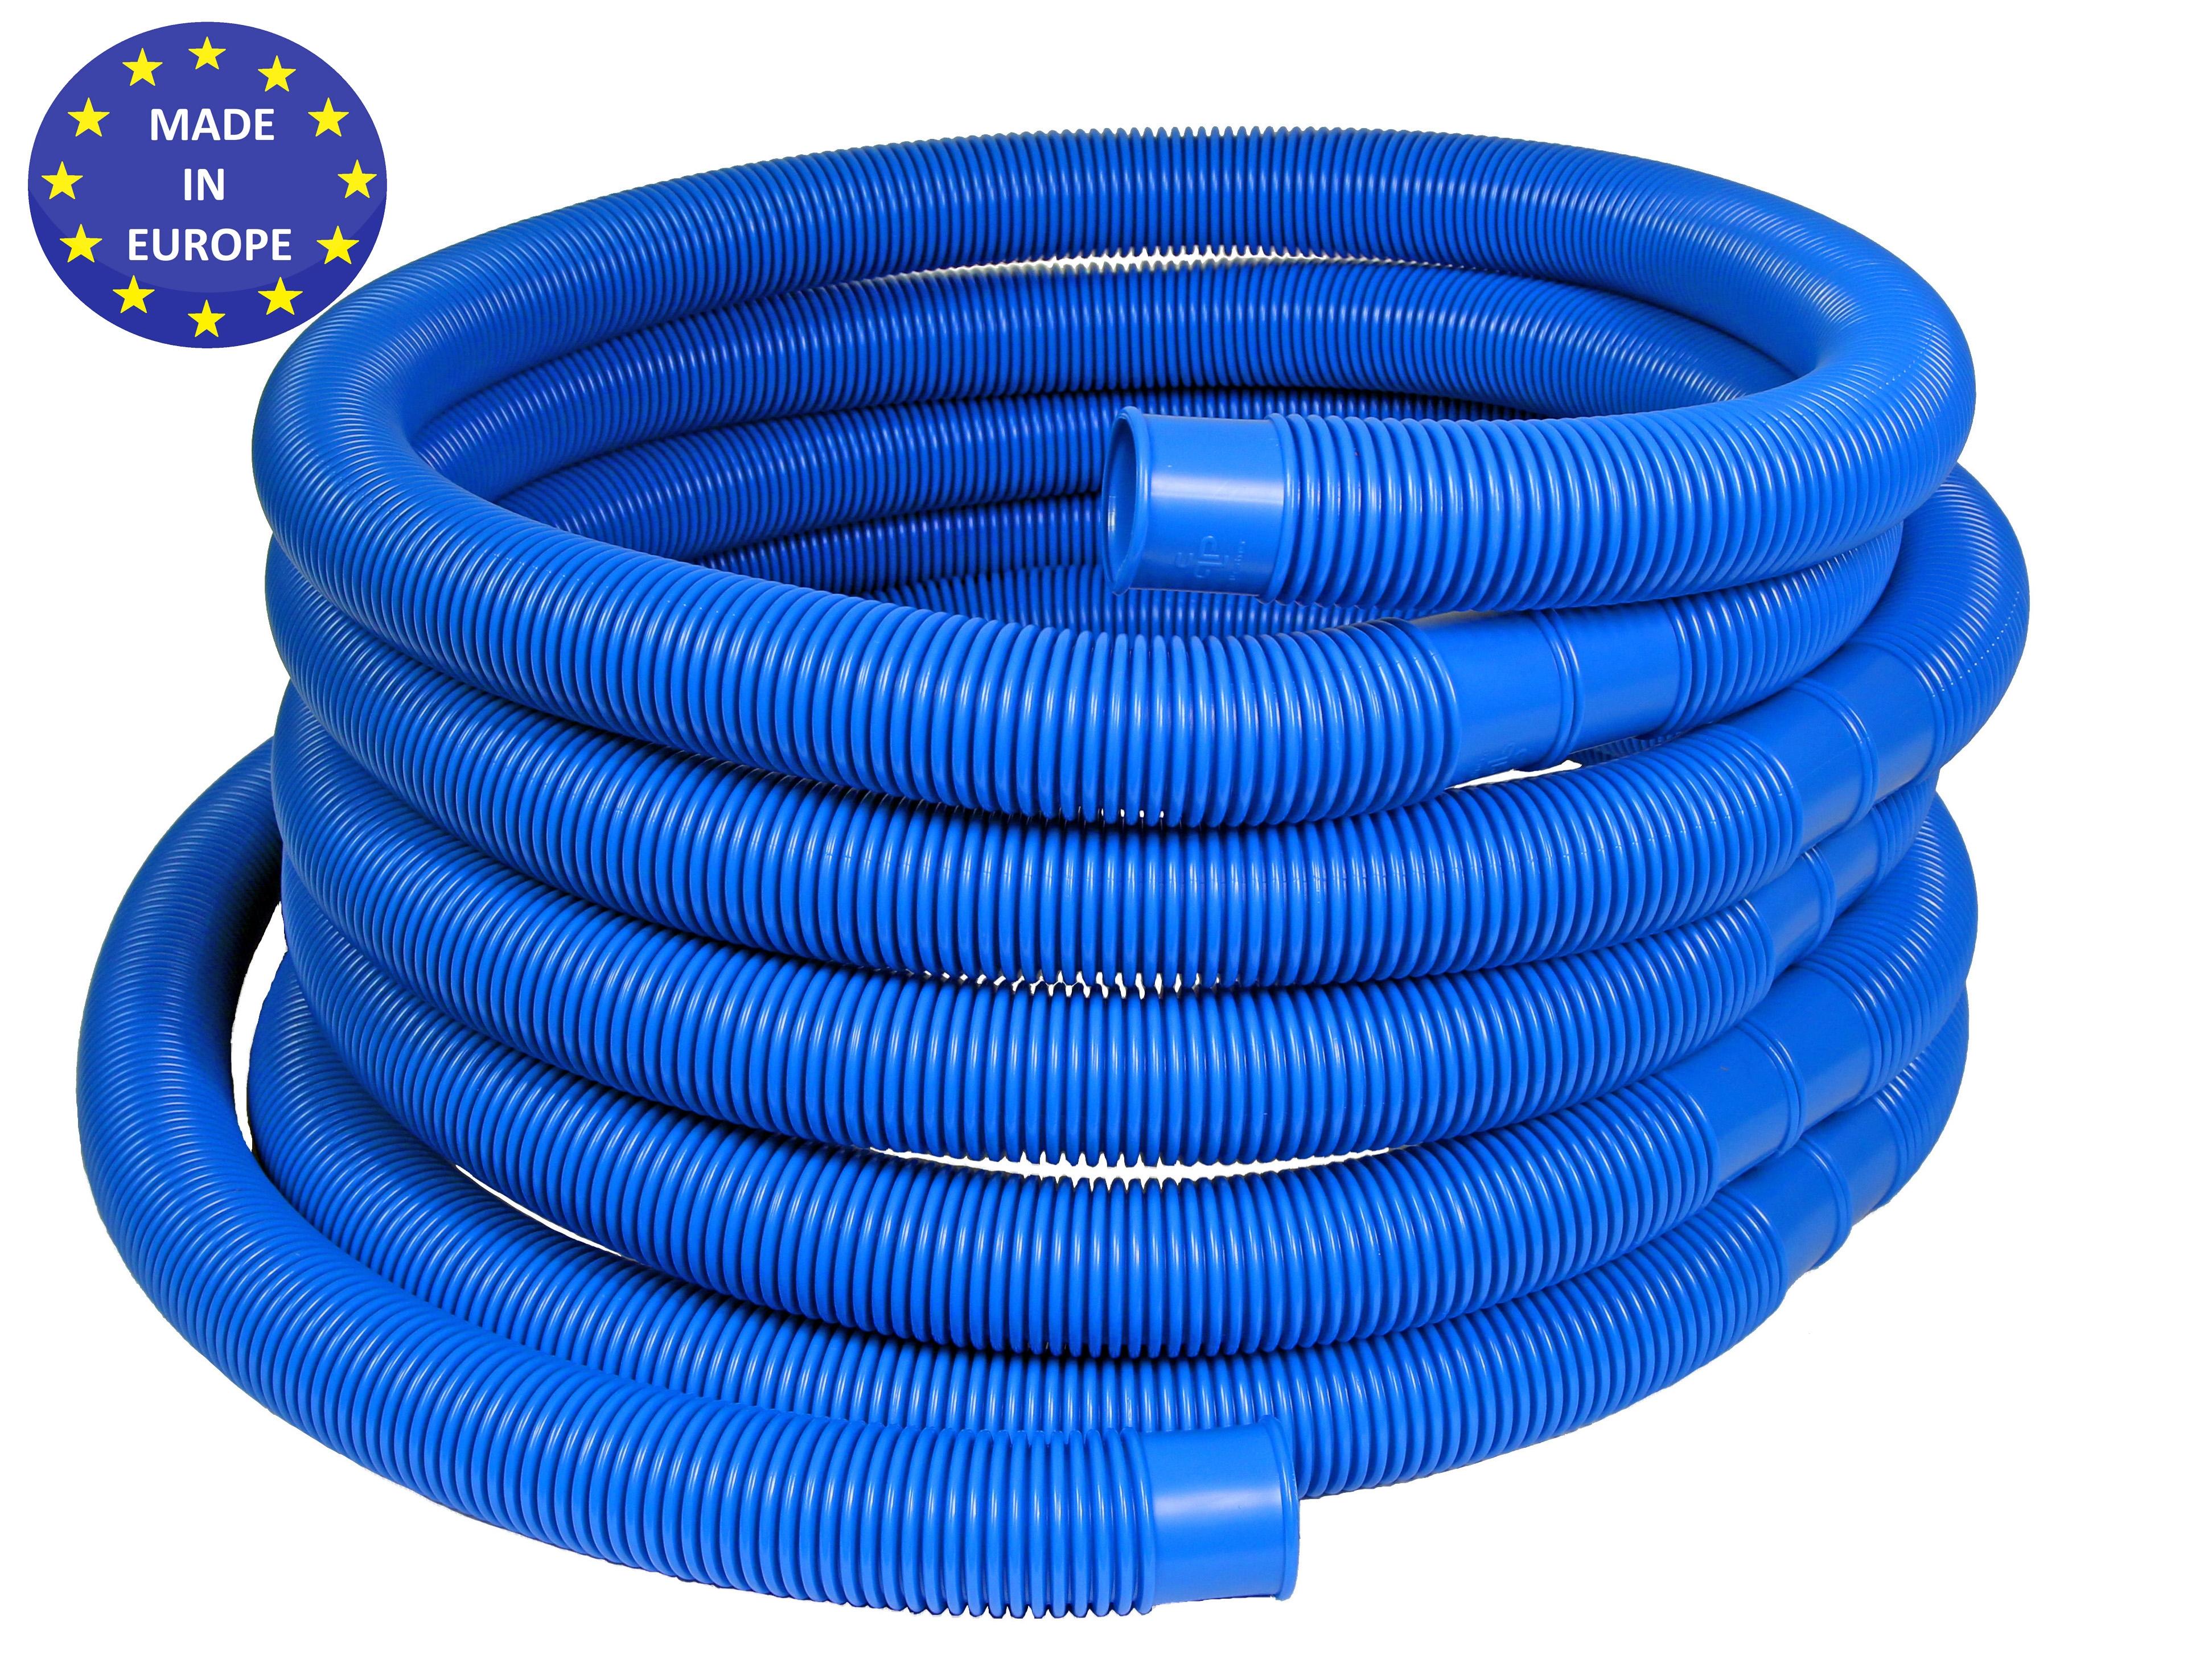 schwimmbadschlauch paket blau 38mm l nge 16 50m pe pool. Black Bedroom Furniture Sets. Home Design Ideas